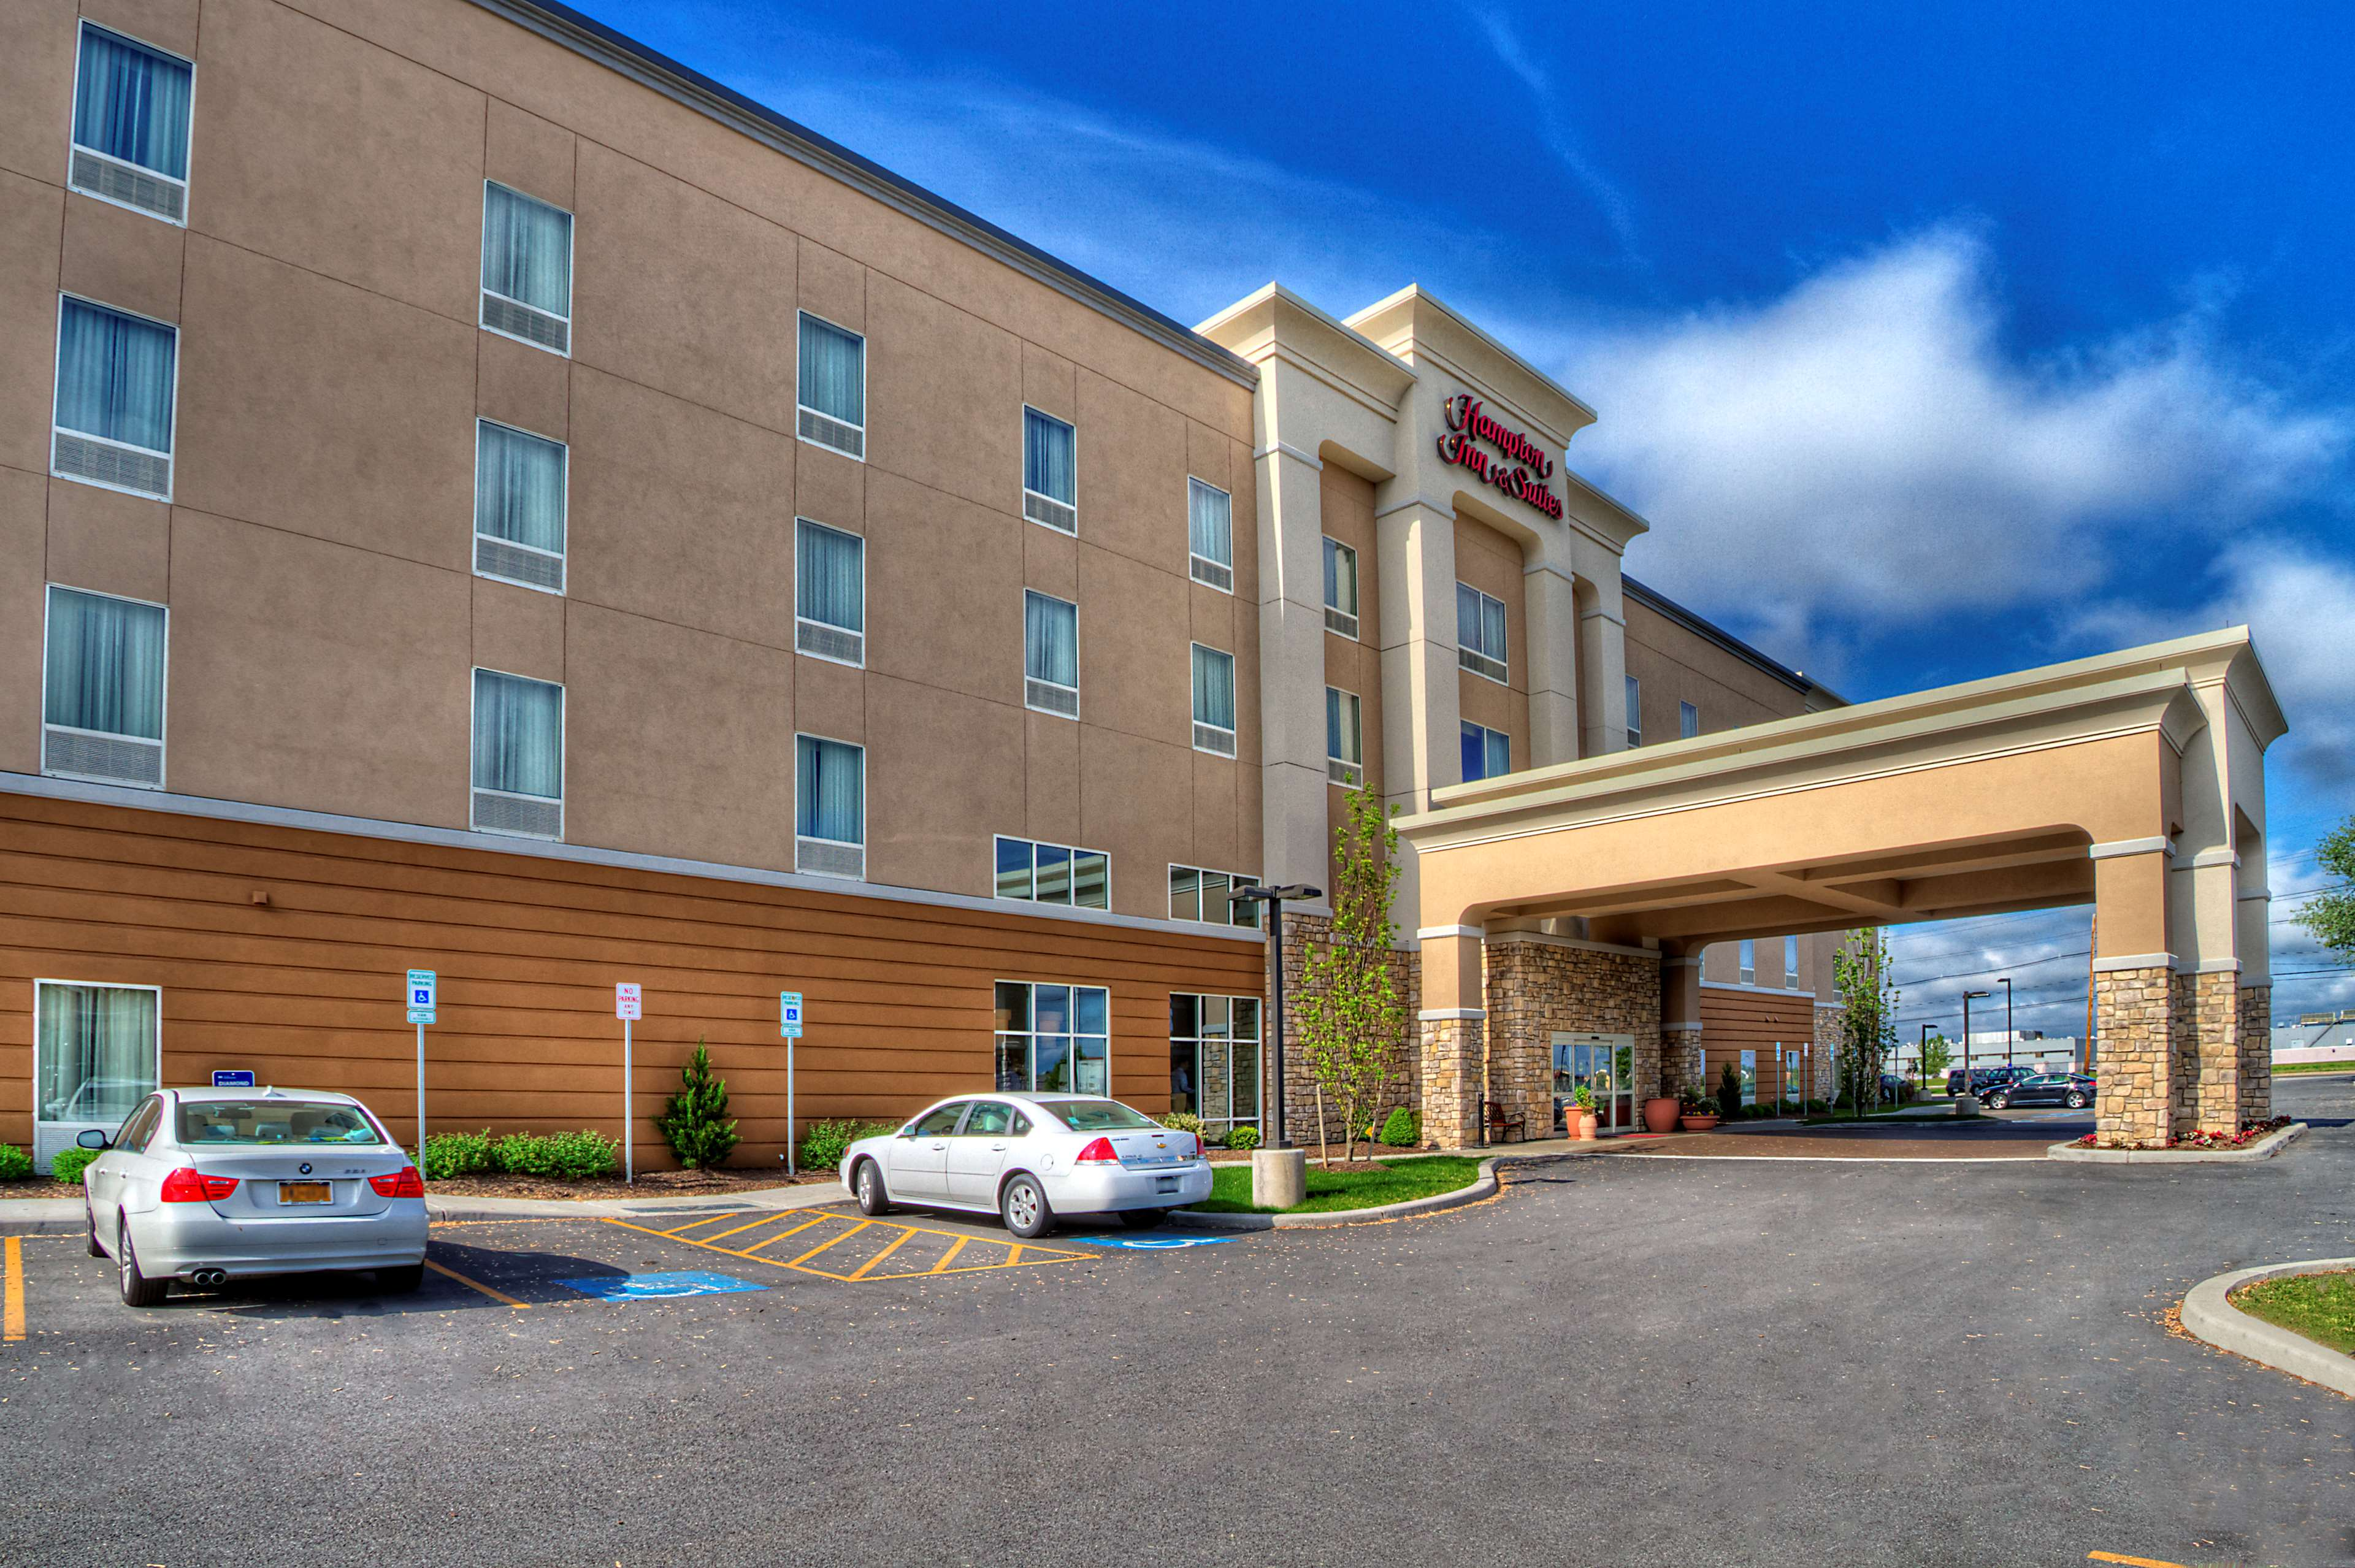 Hampton Inn & Suites Rochester/Henrietta image 1